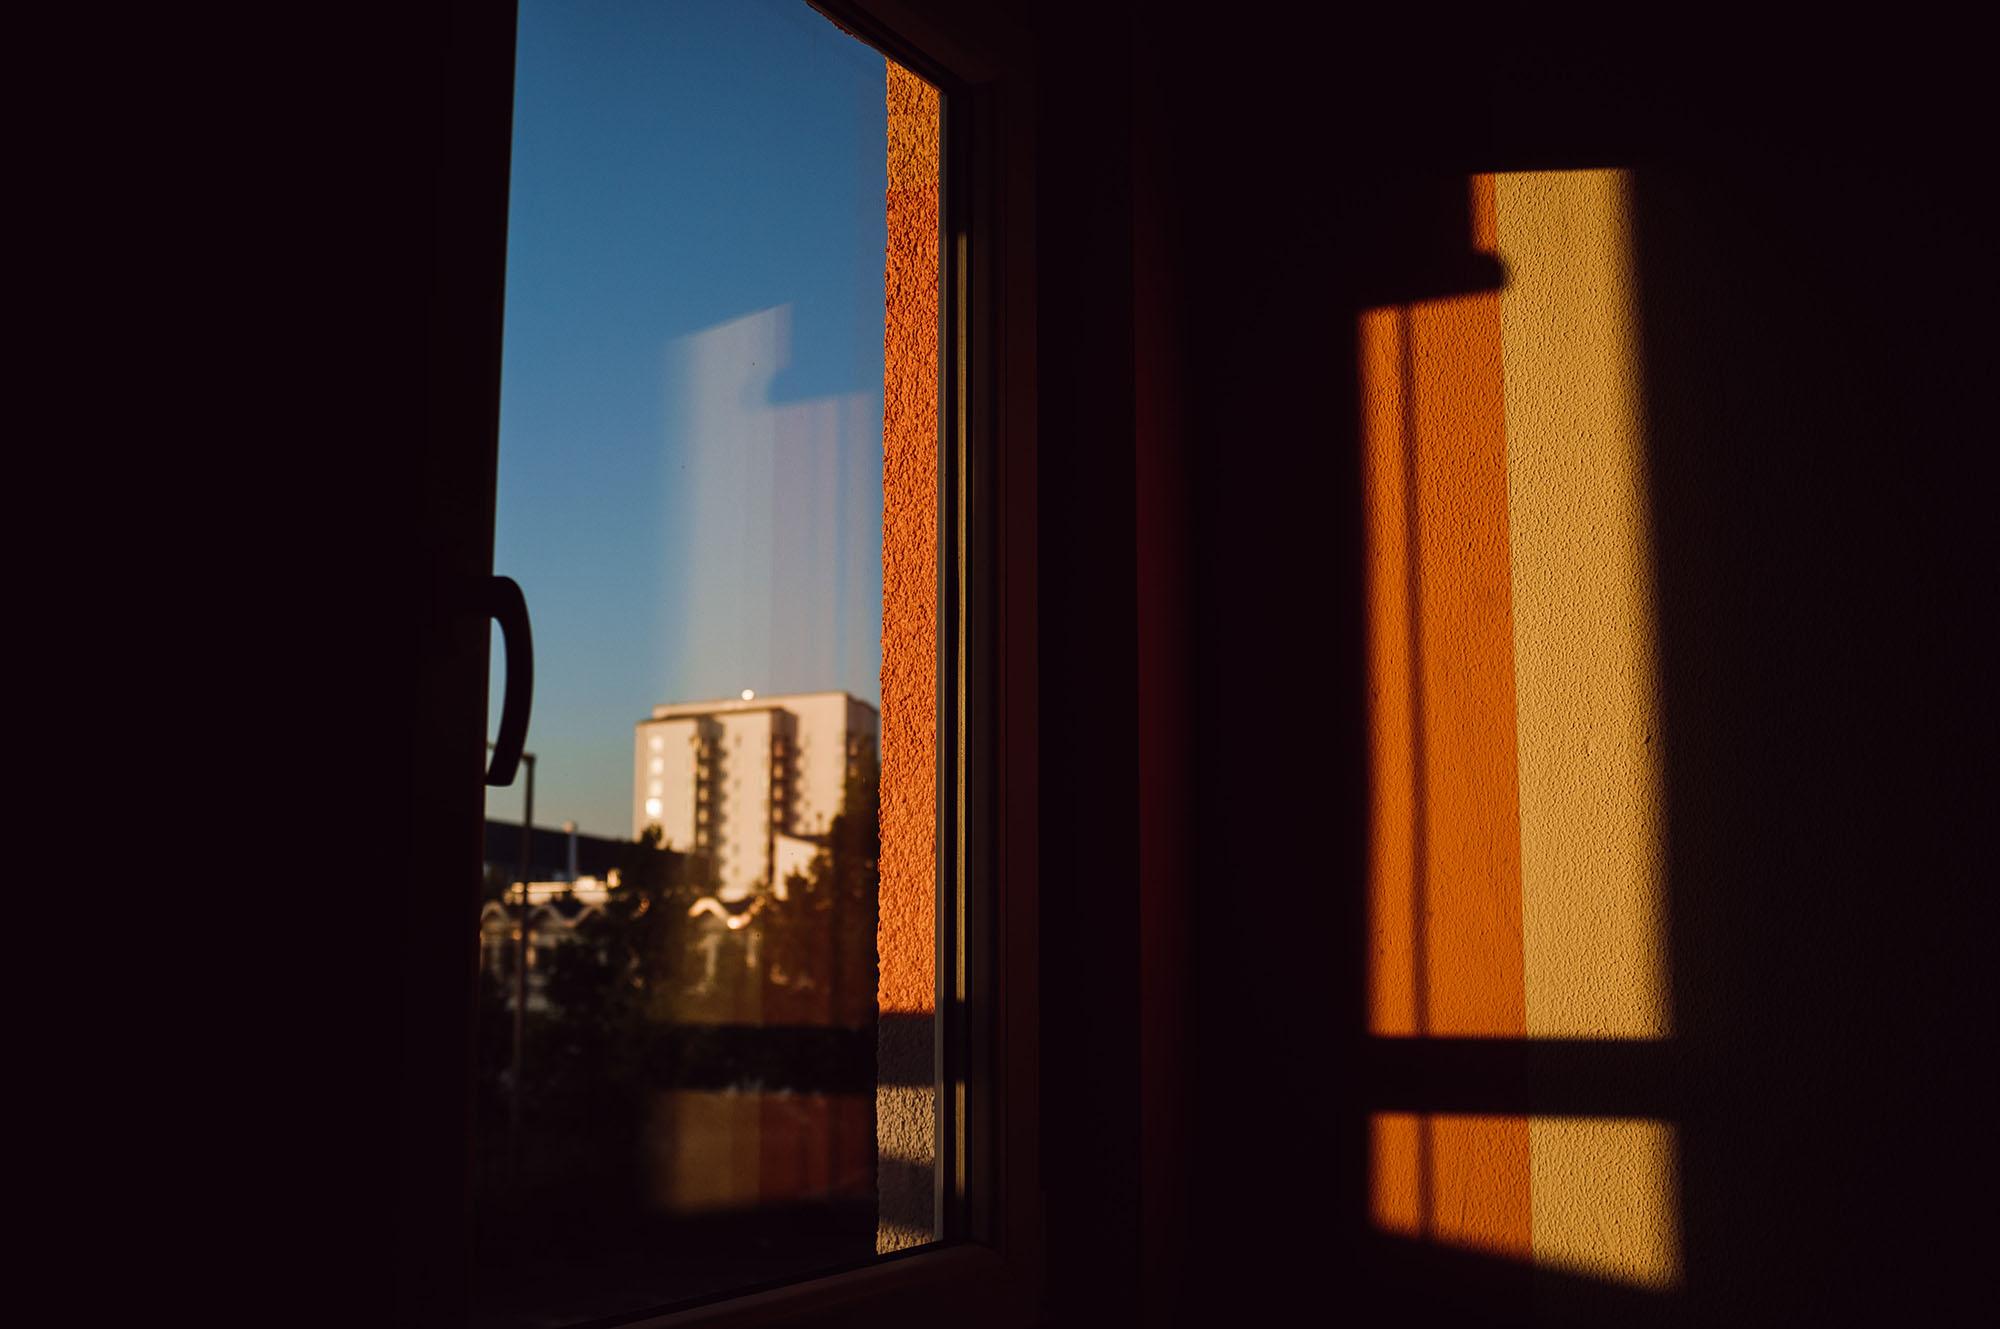 leipzig sunshine through window